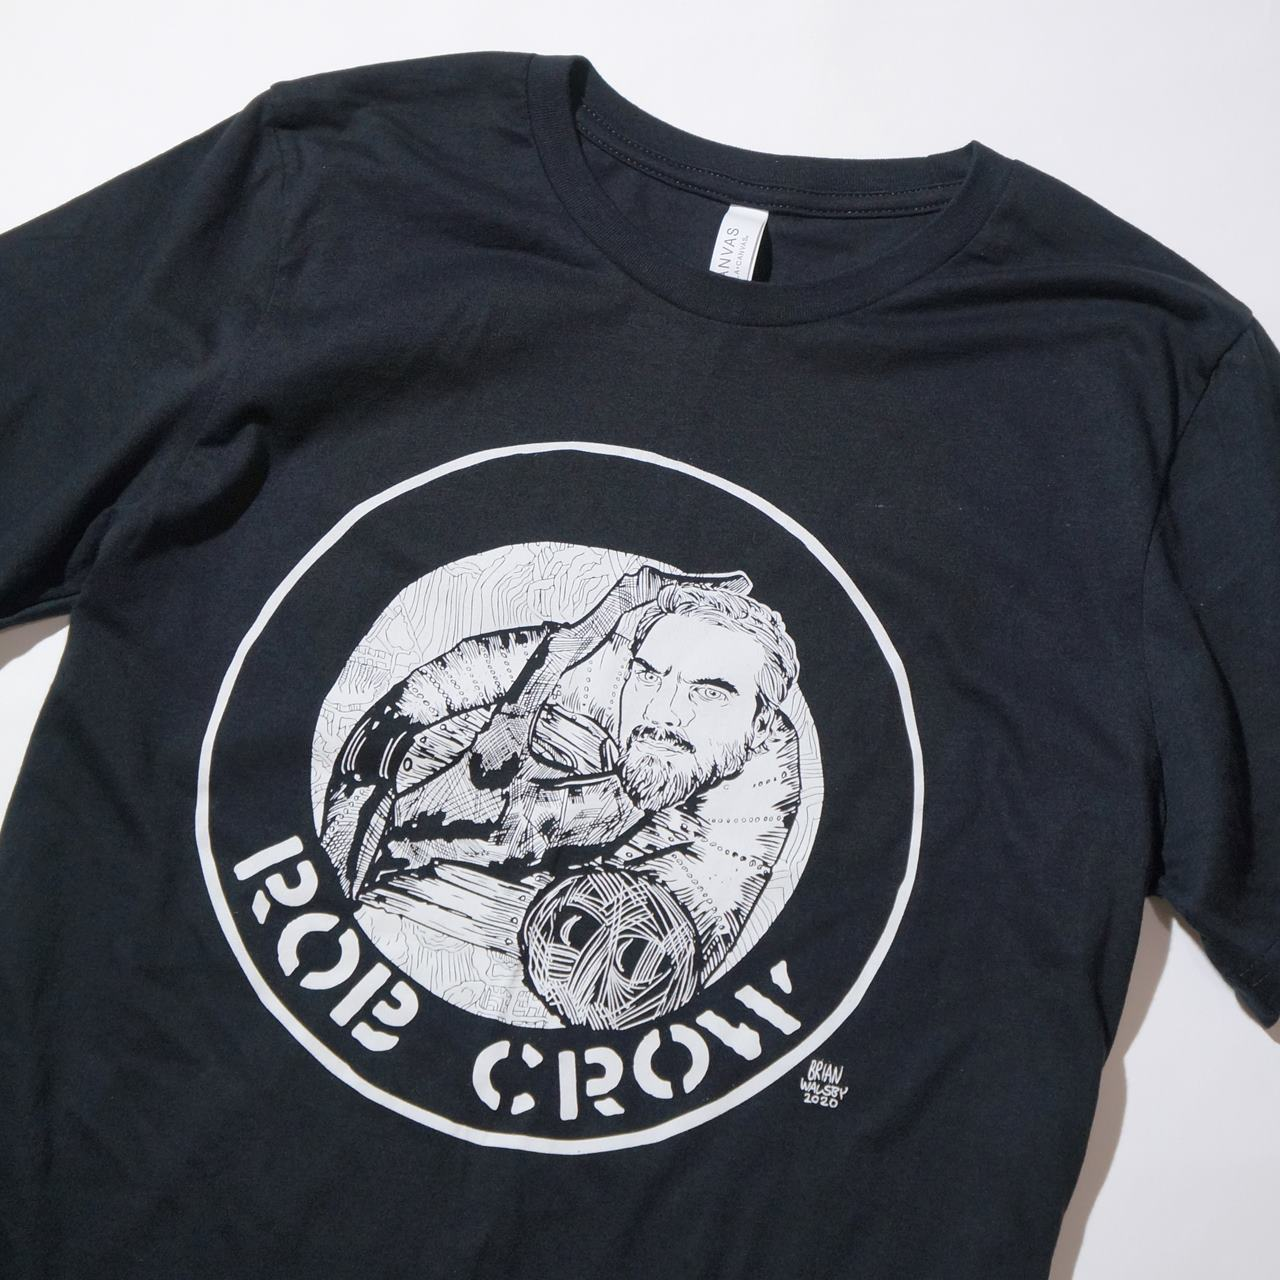 (SALE)ROB CROW Tシャツ Rudimentary-Black